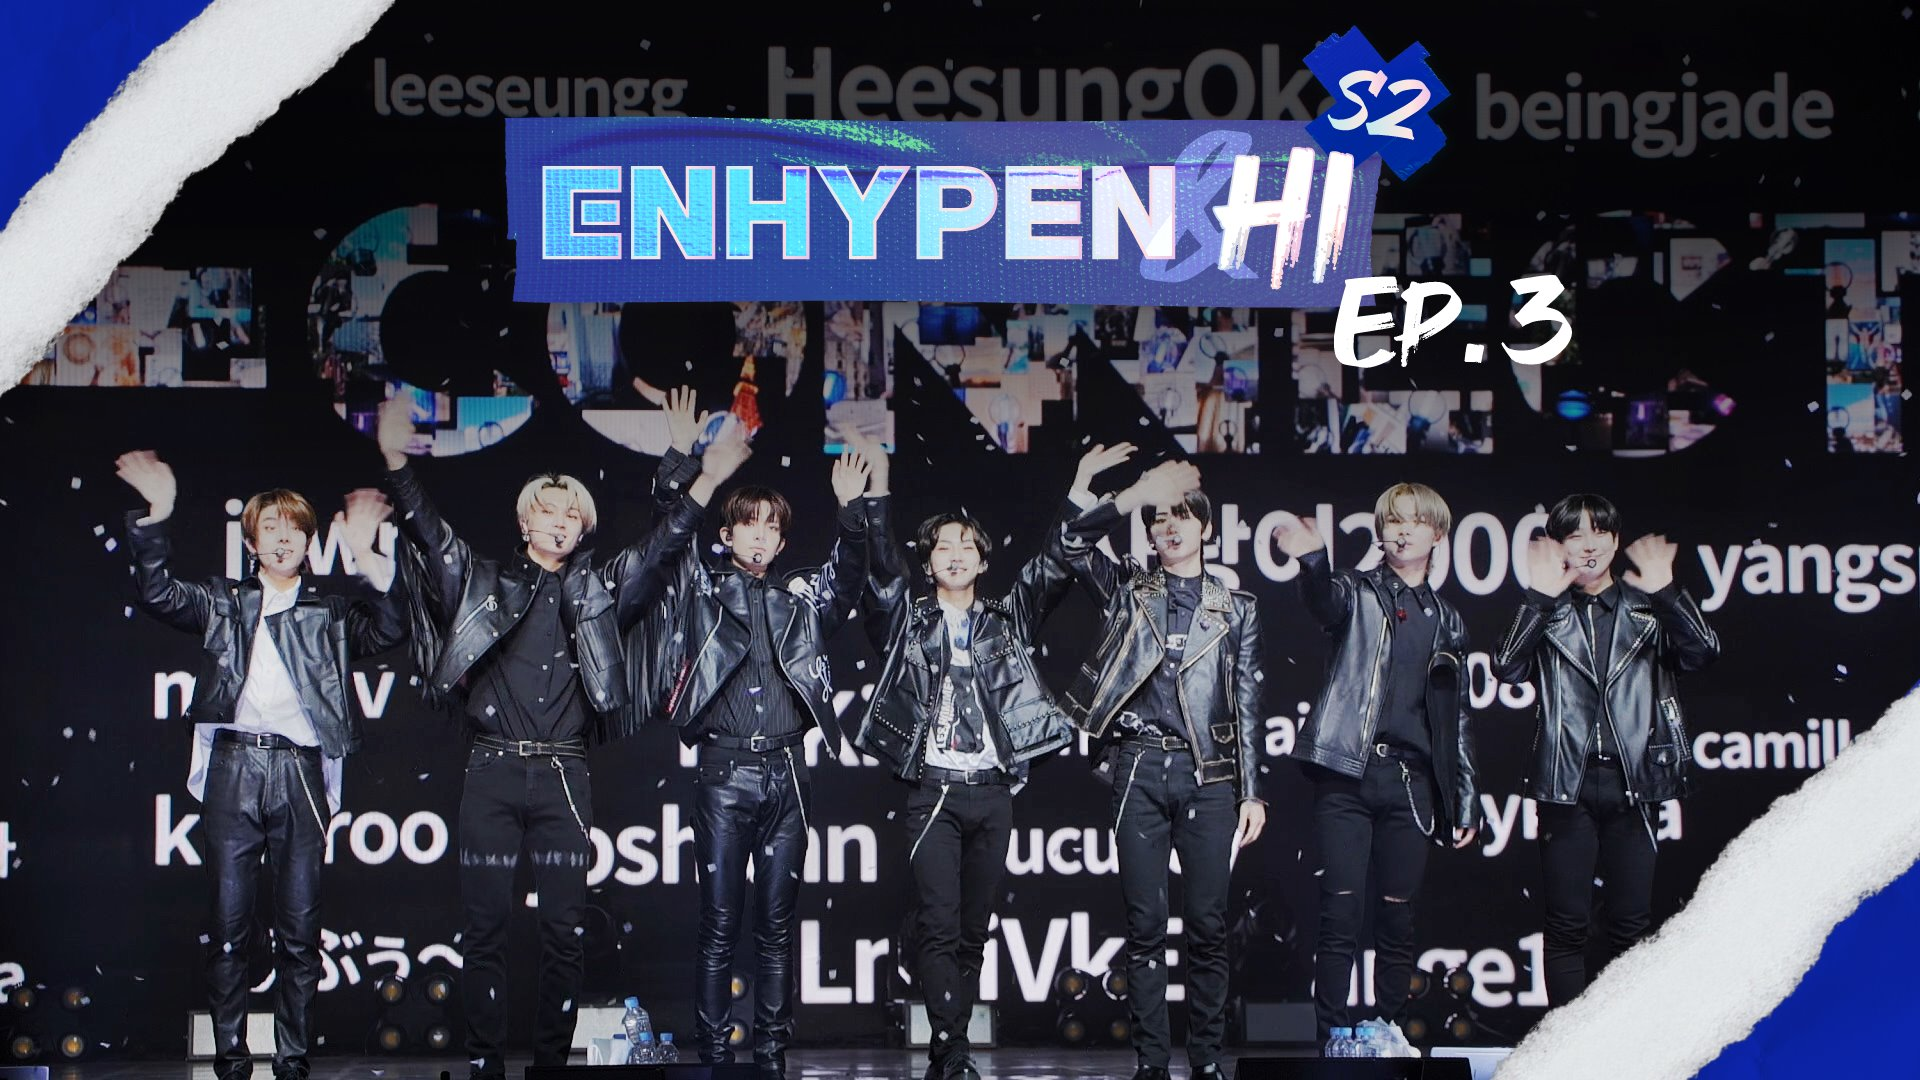 ENHYPEN (엔하이픈) 'ENHYPEN&Hi' Season 2 EP.3